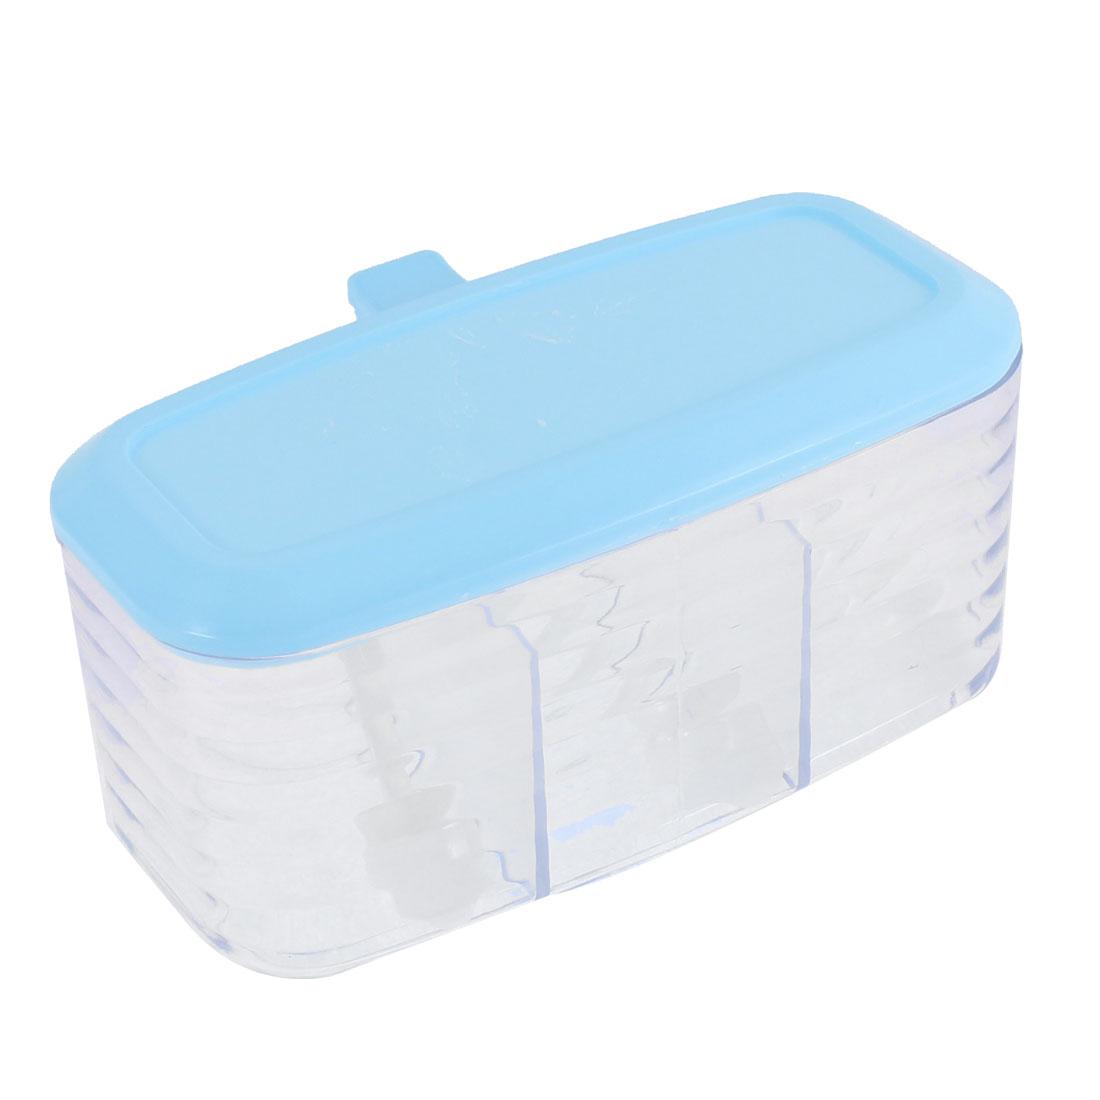 Kitchen 3 Compartments Salt Seasoning Spice Cruet Condiment Container Case Sky Blue